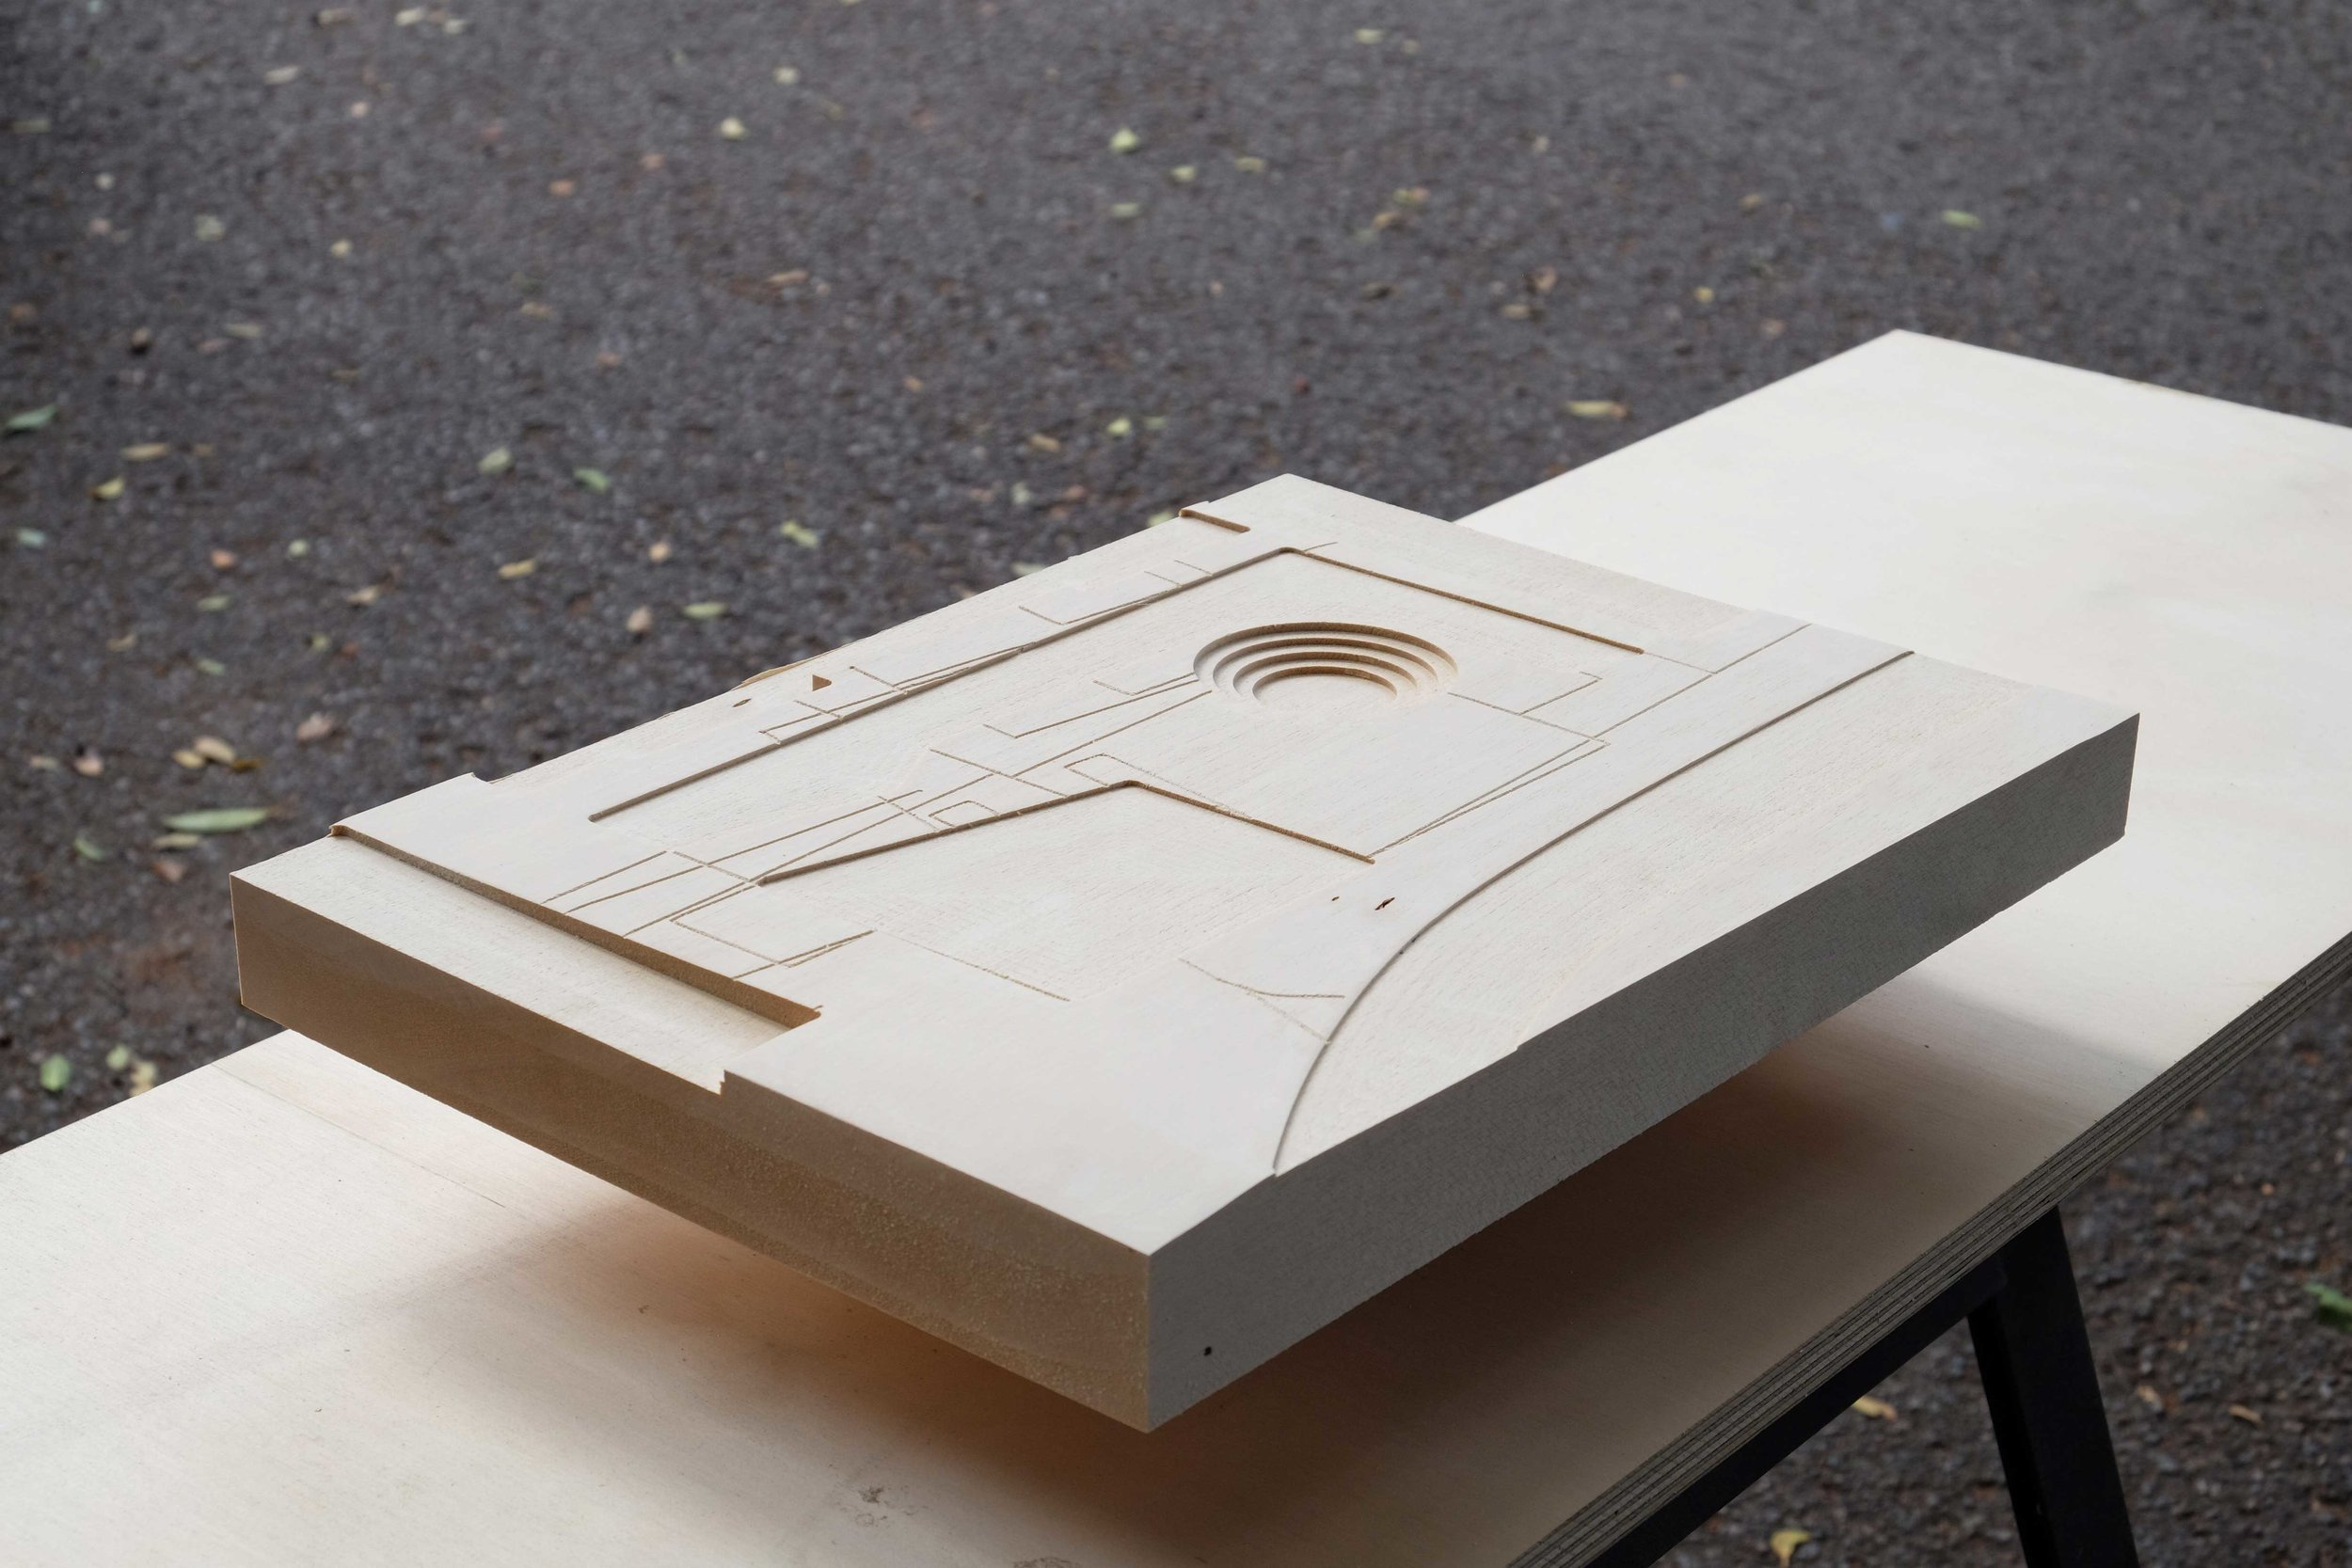 make_fab_cnc_fabrication_timber.jpg